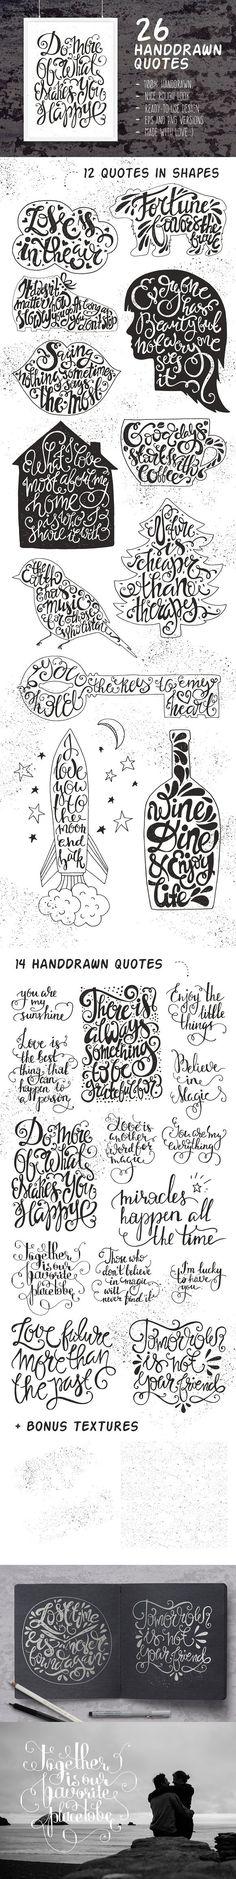 26 Handdrawn Romantic Posters. Romantic Fonts